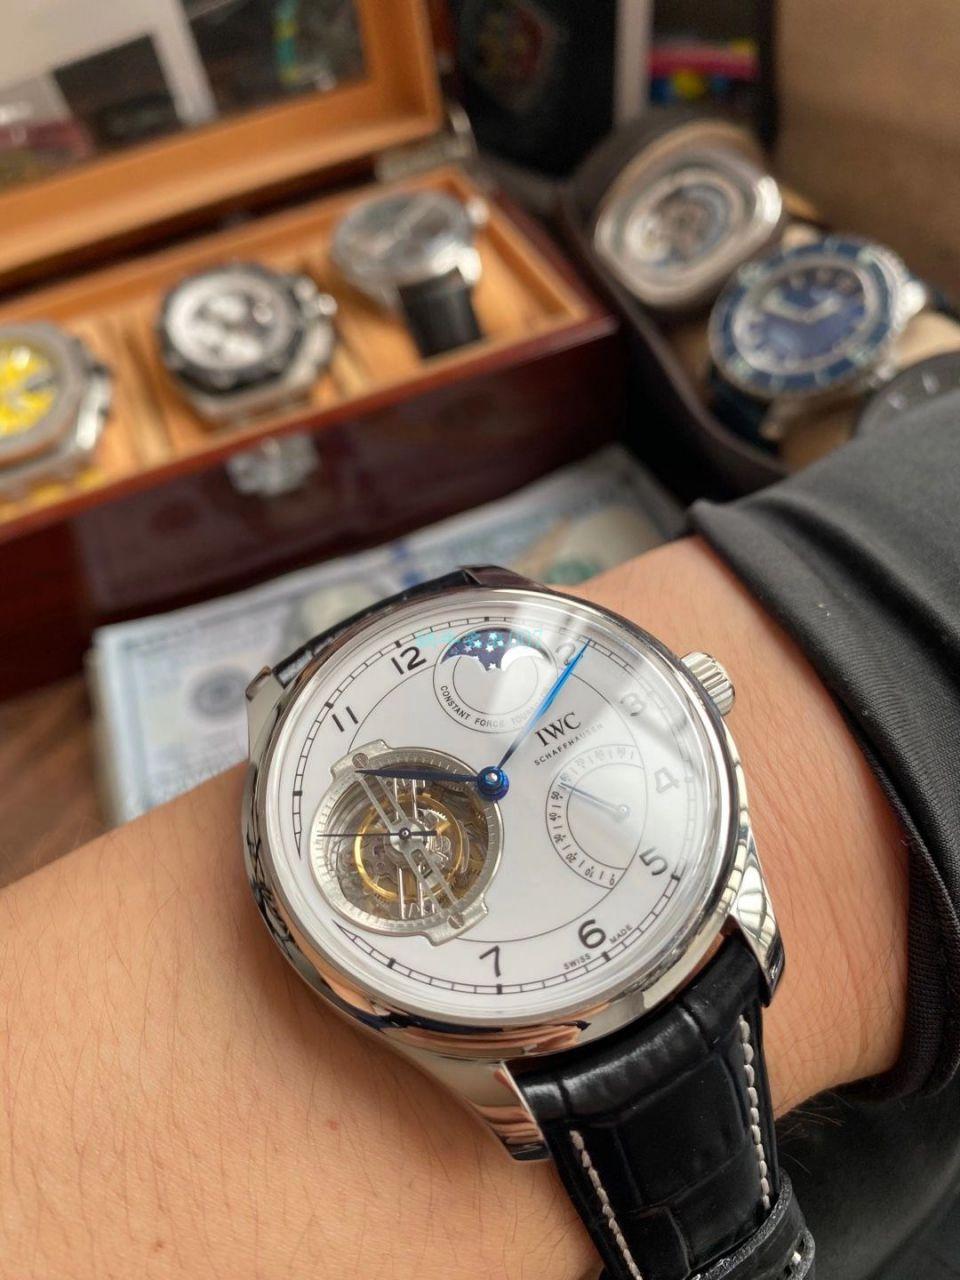 BBR厂万国一比一顶级高仿陀飞轮手表IW590110腕表 / WG601